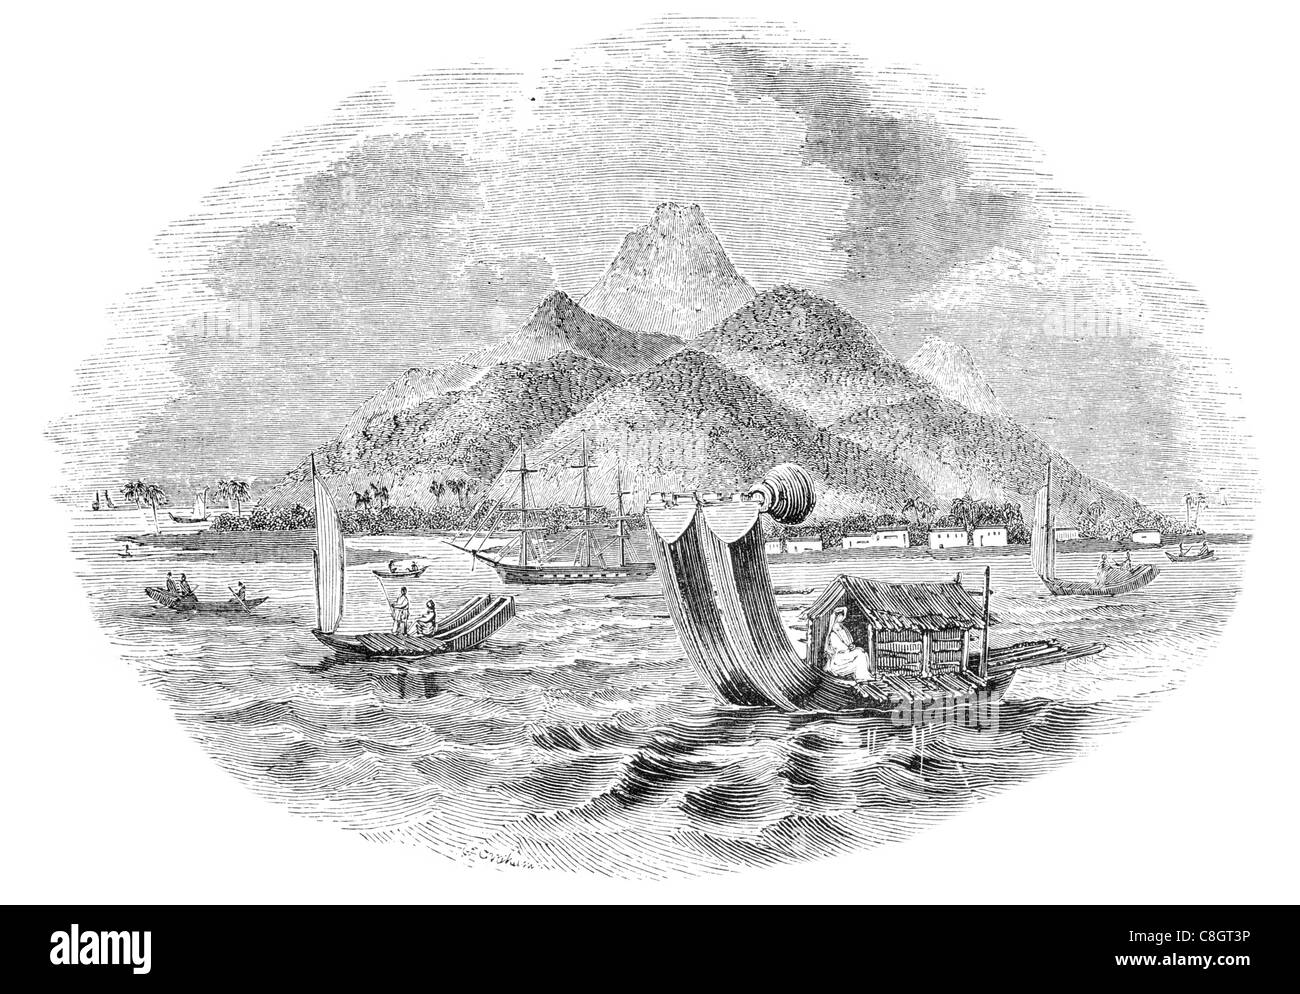 double canoes of Tahiti or Otaheite fishing sailor fisherman sail sailing sailor ship ships shipping marine vessel - Stock Image